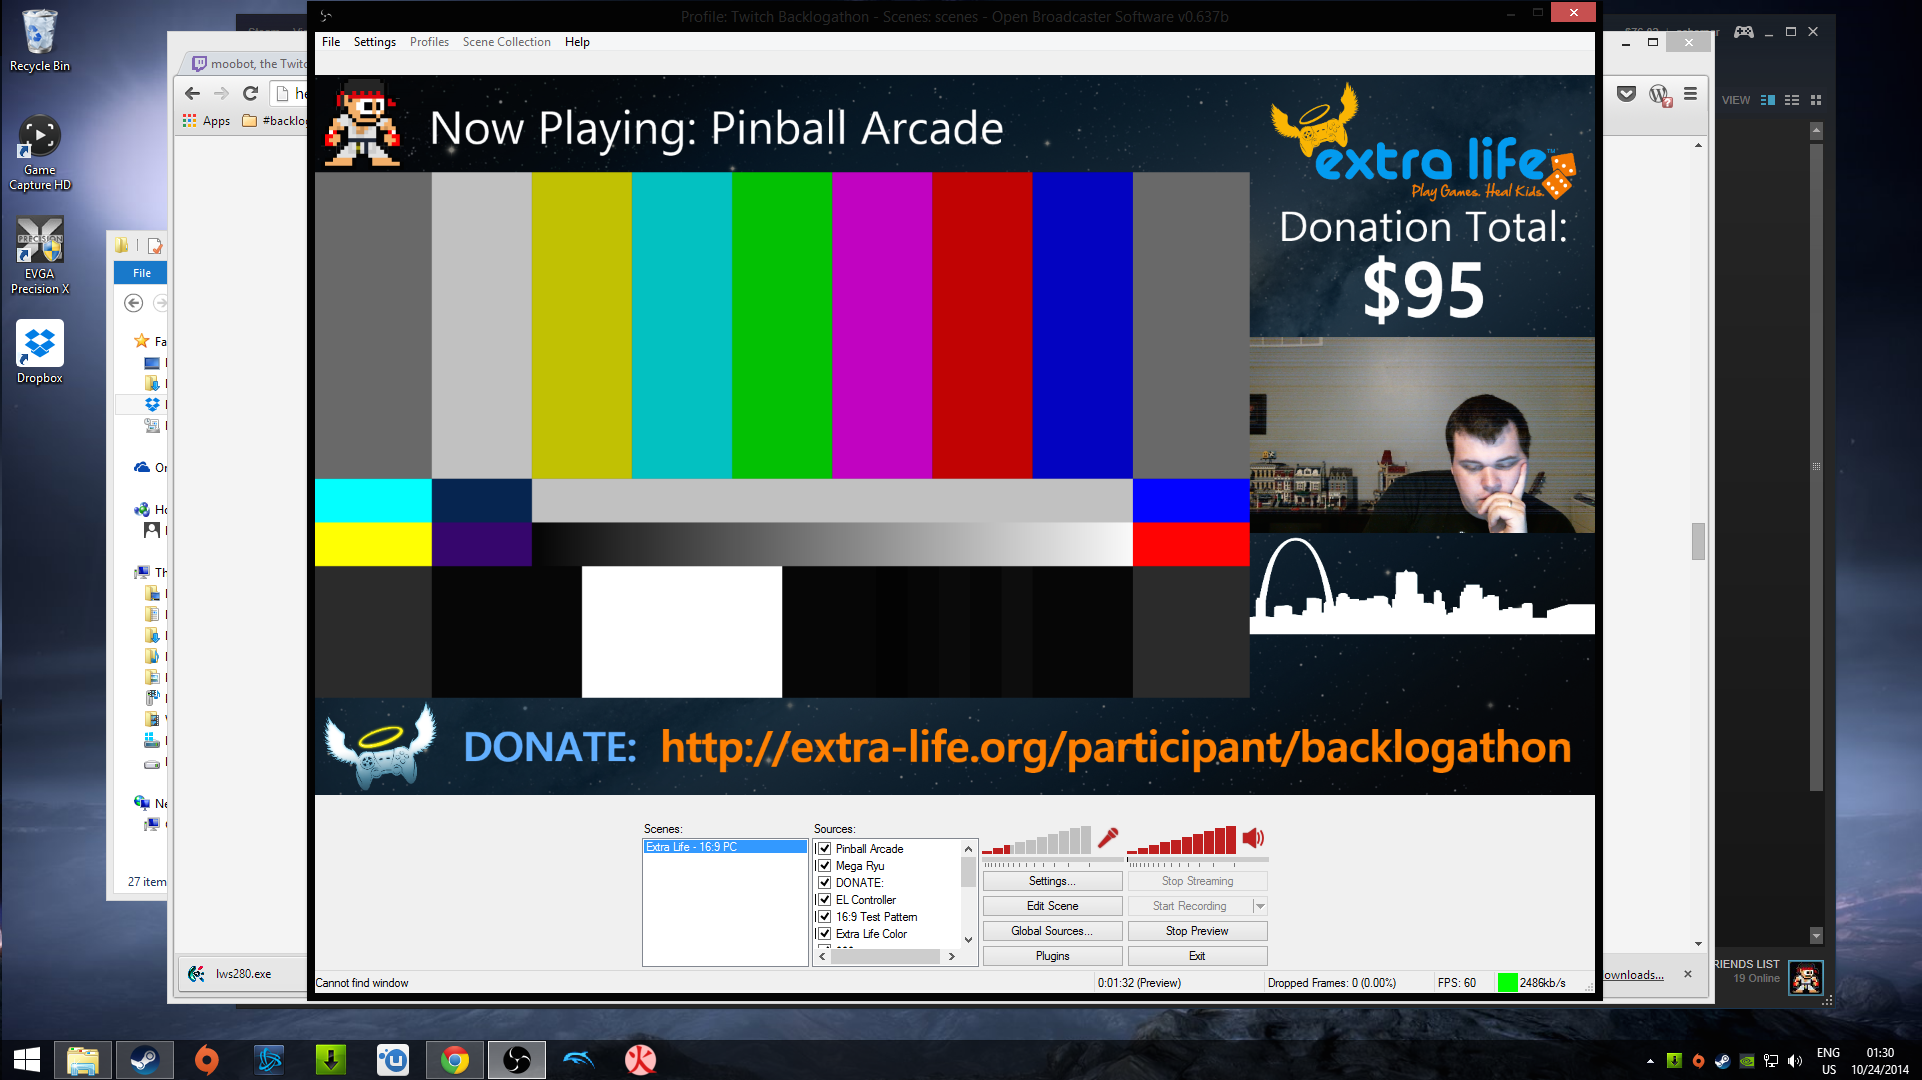 Screenshot 2014-10-24 01.30.39